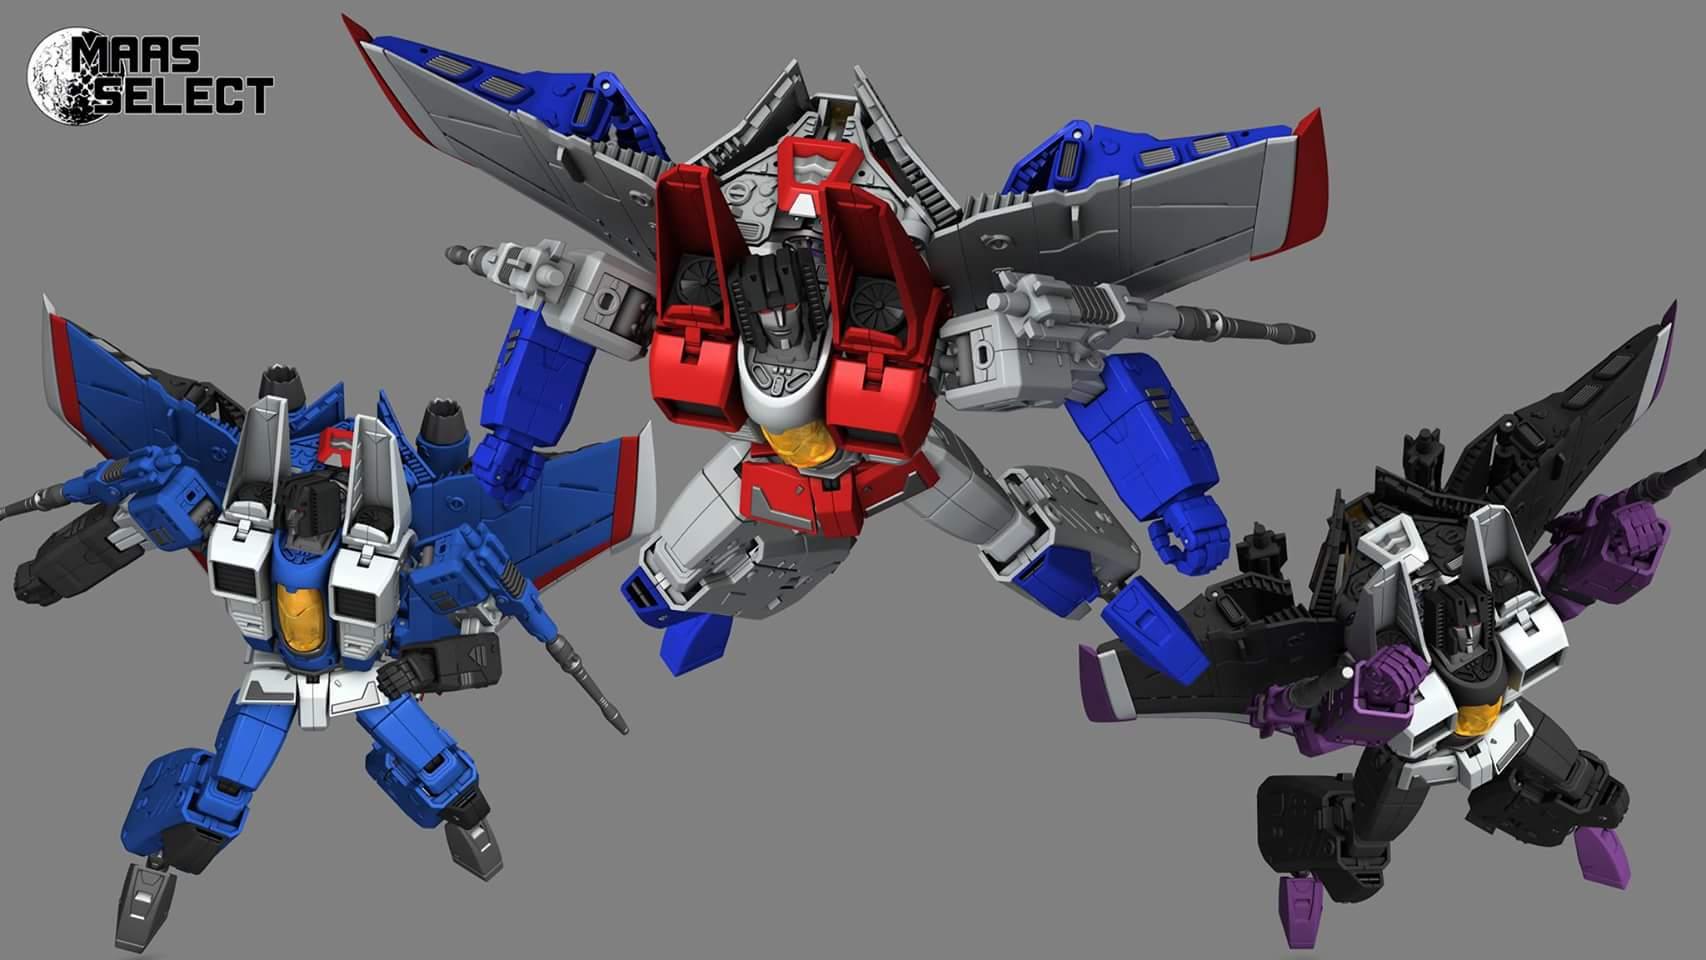 [MAAS Toys] Produit Tiers - Jouets TF de la gamme Cybertech Series (mode Cybertronien) + Gee Too (G2) - Page 2 EnErxNpL_o